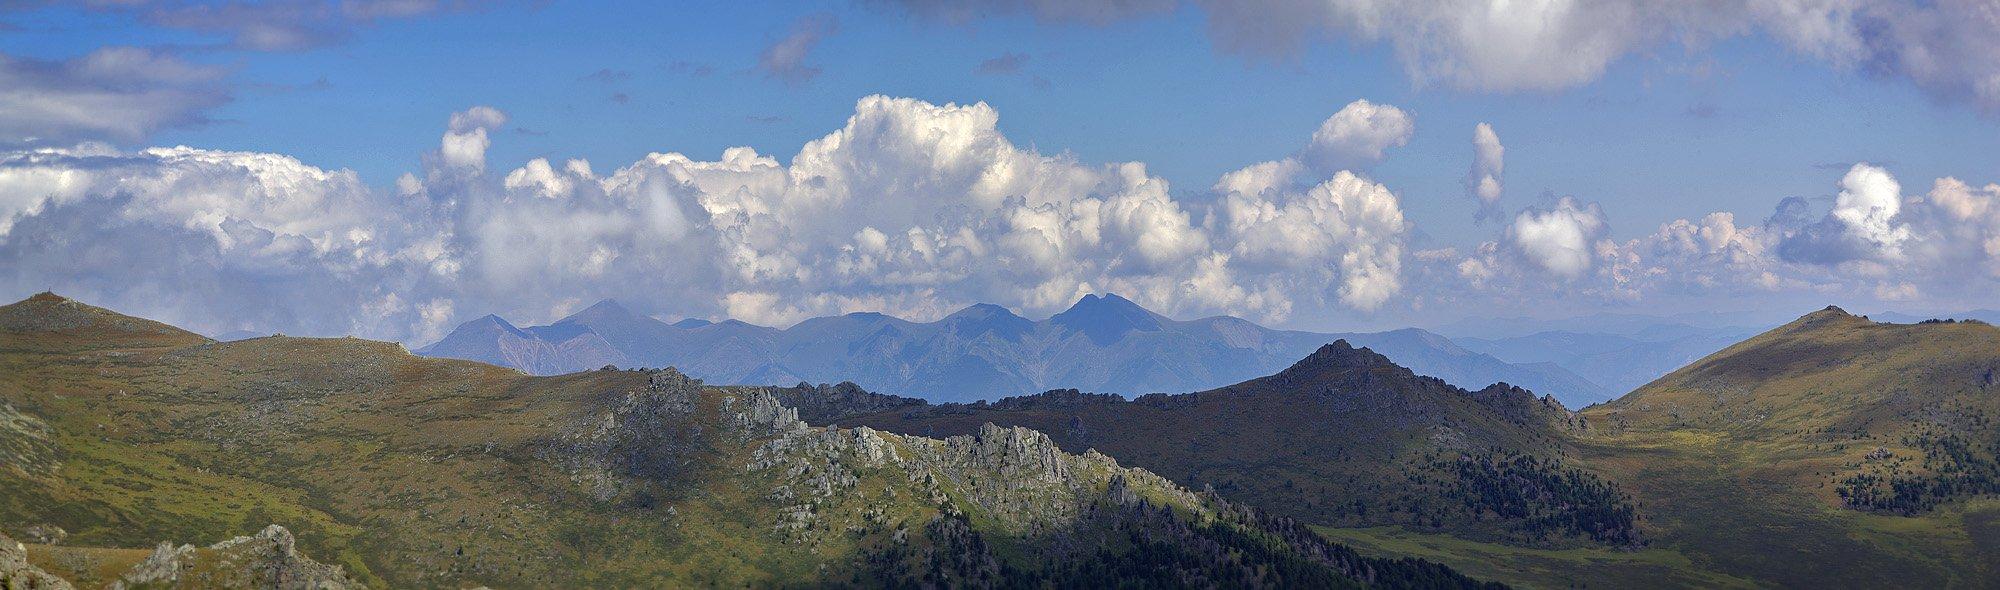 горы, облака, Anastasia Aymilios